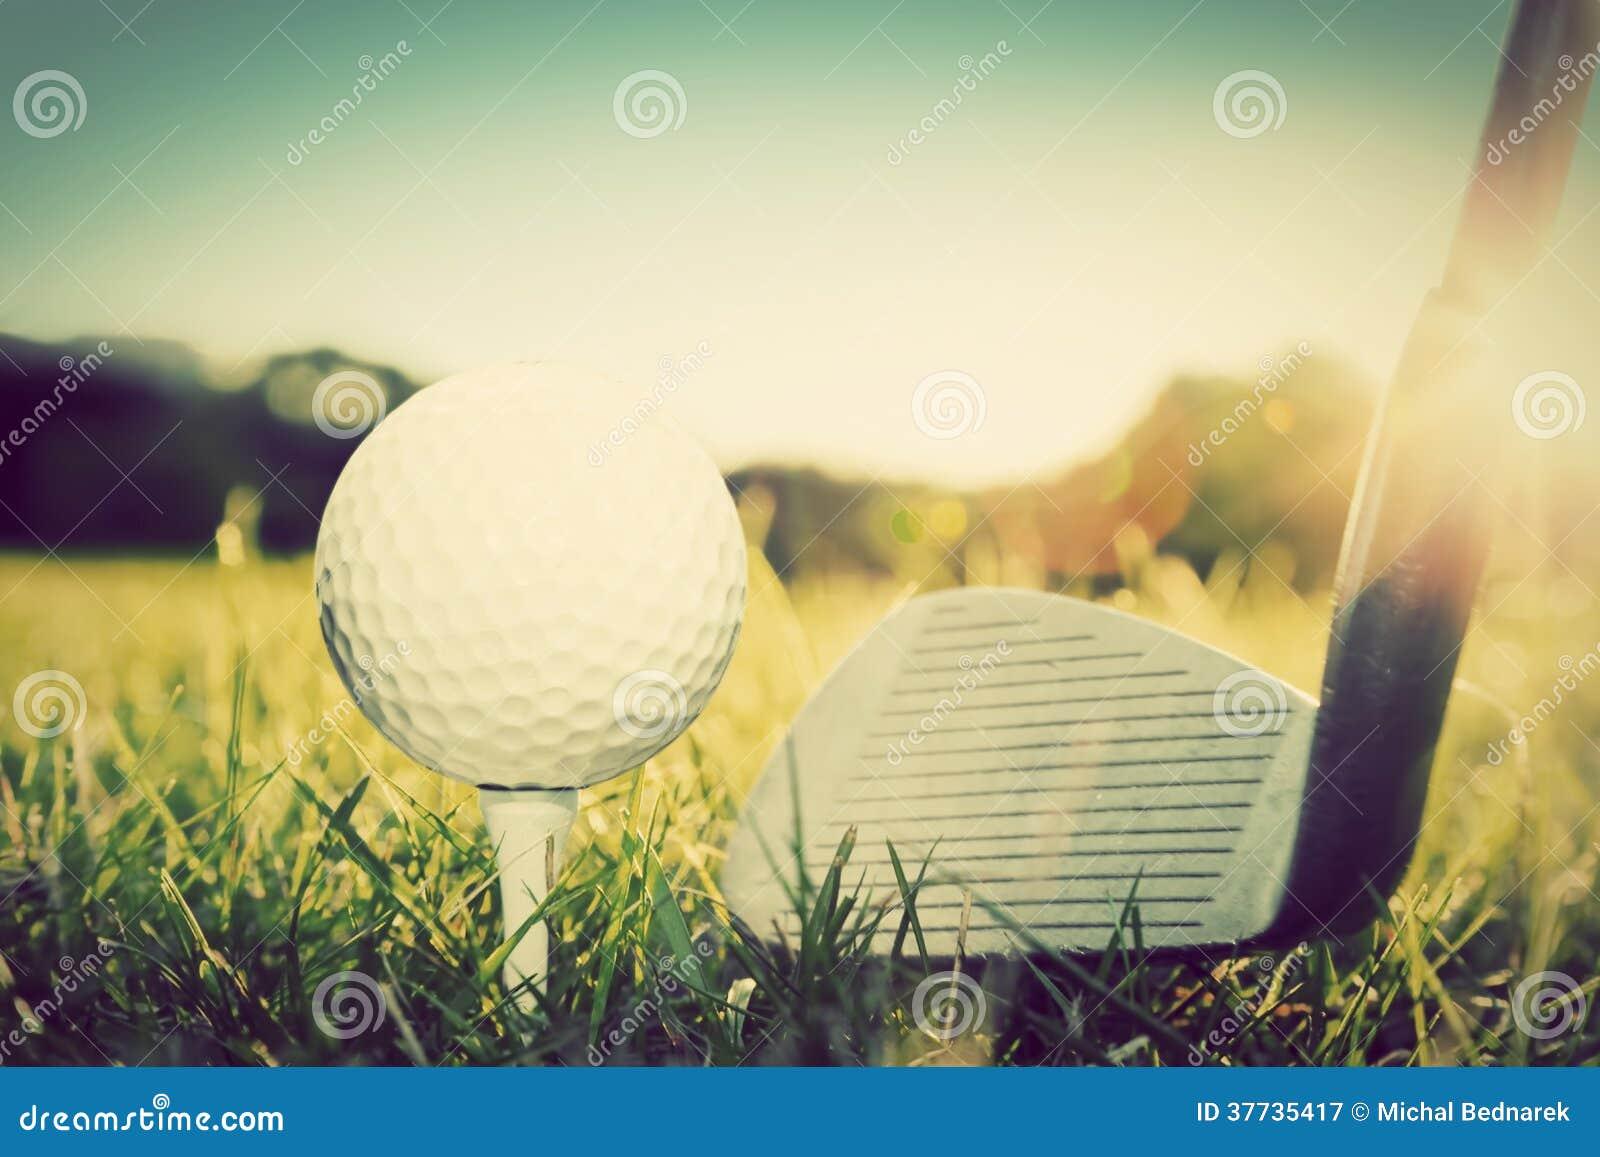 Playing golf, ball on tee and golf club